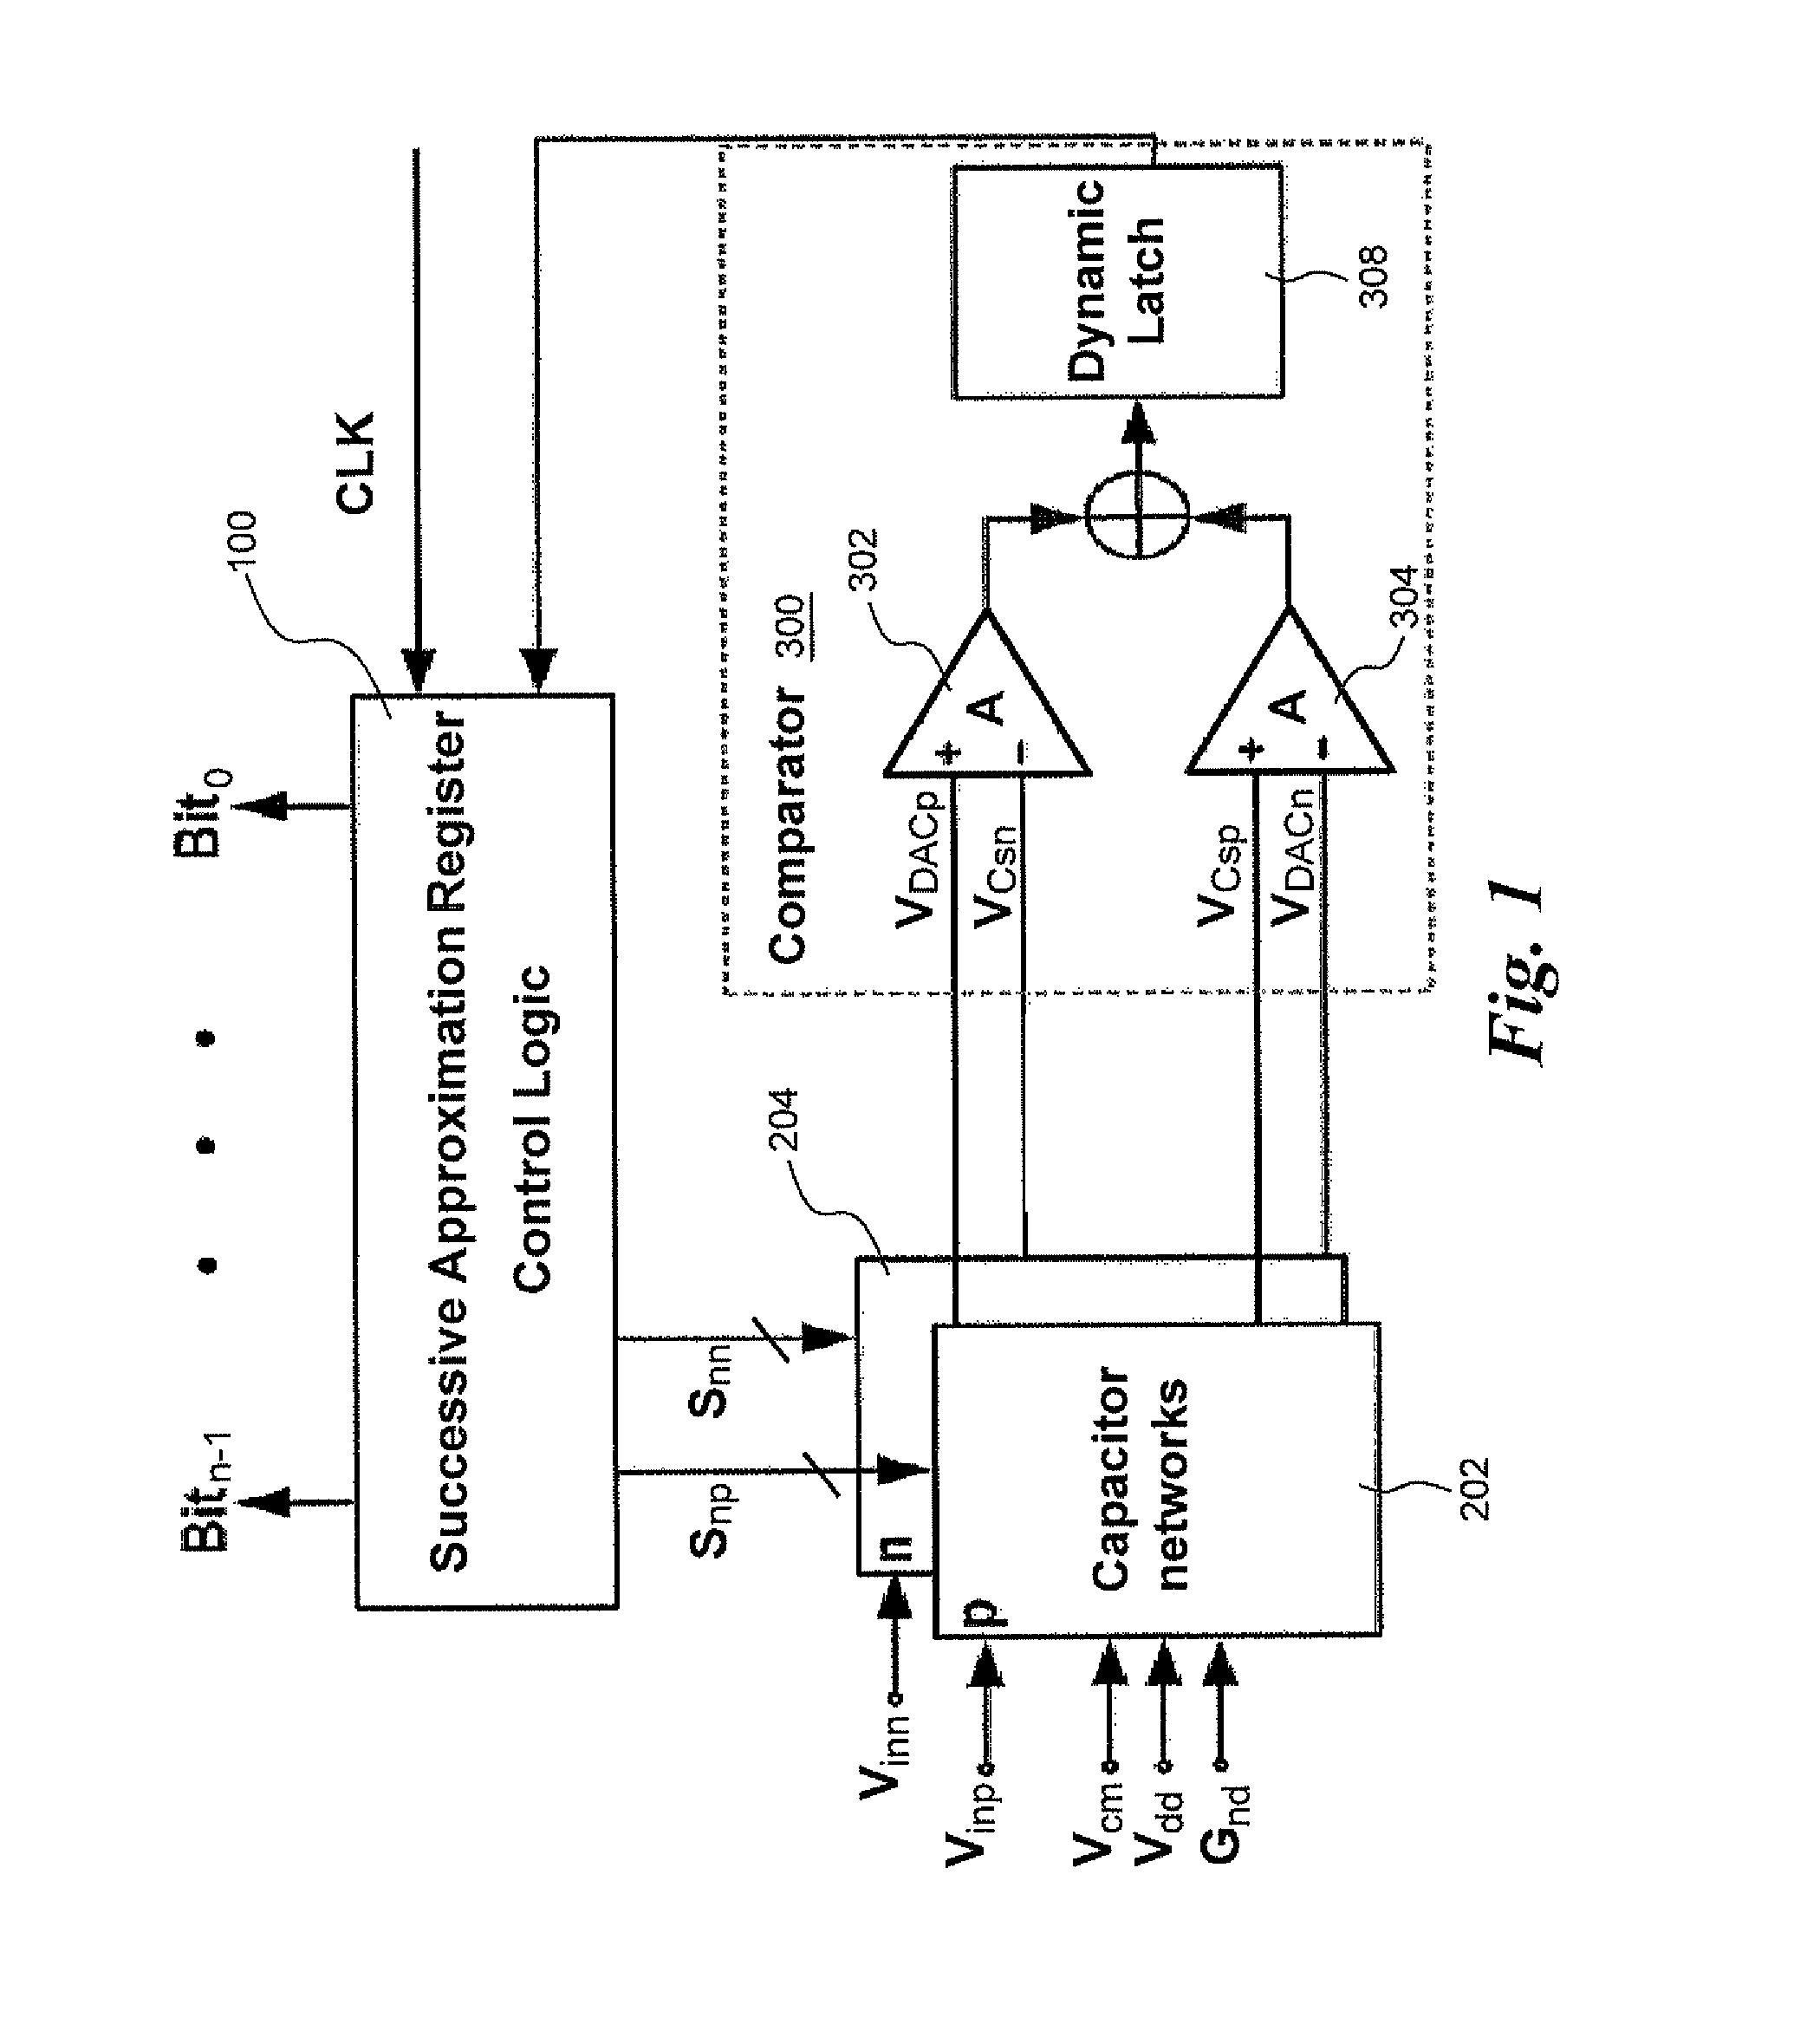 patente us8344931